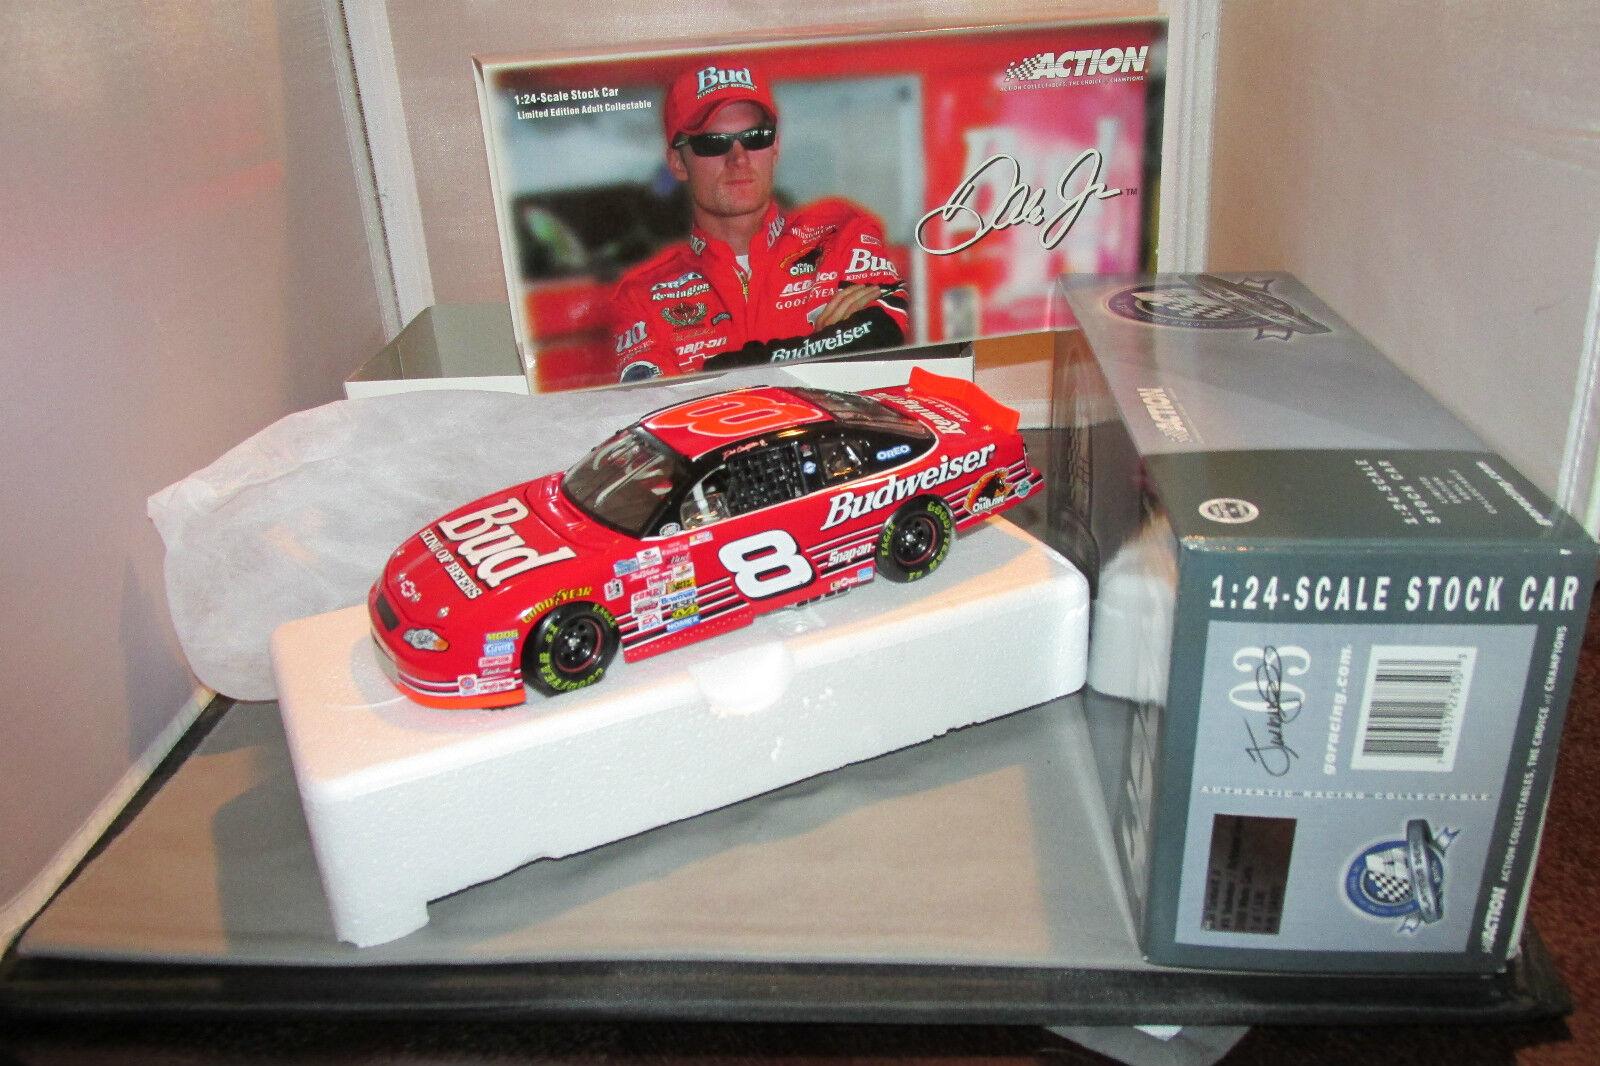 2000 Dale Earnhardt Jr. Budweiser   Richmond Richmond Richmond Race  Action 1 of 1,536 Bank bb6933